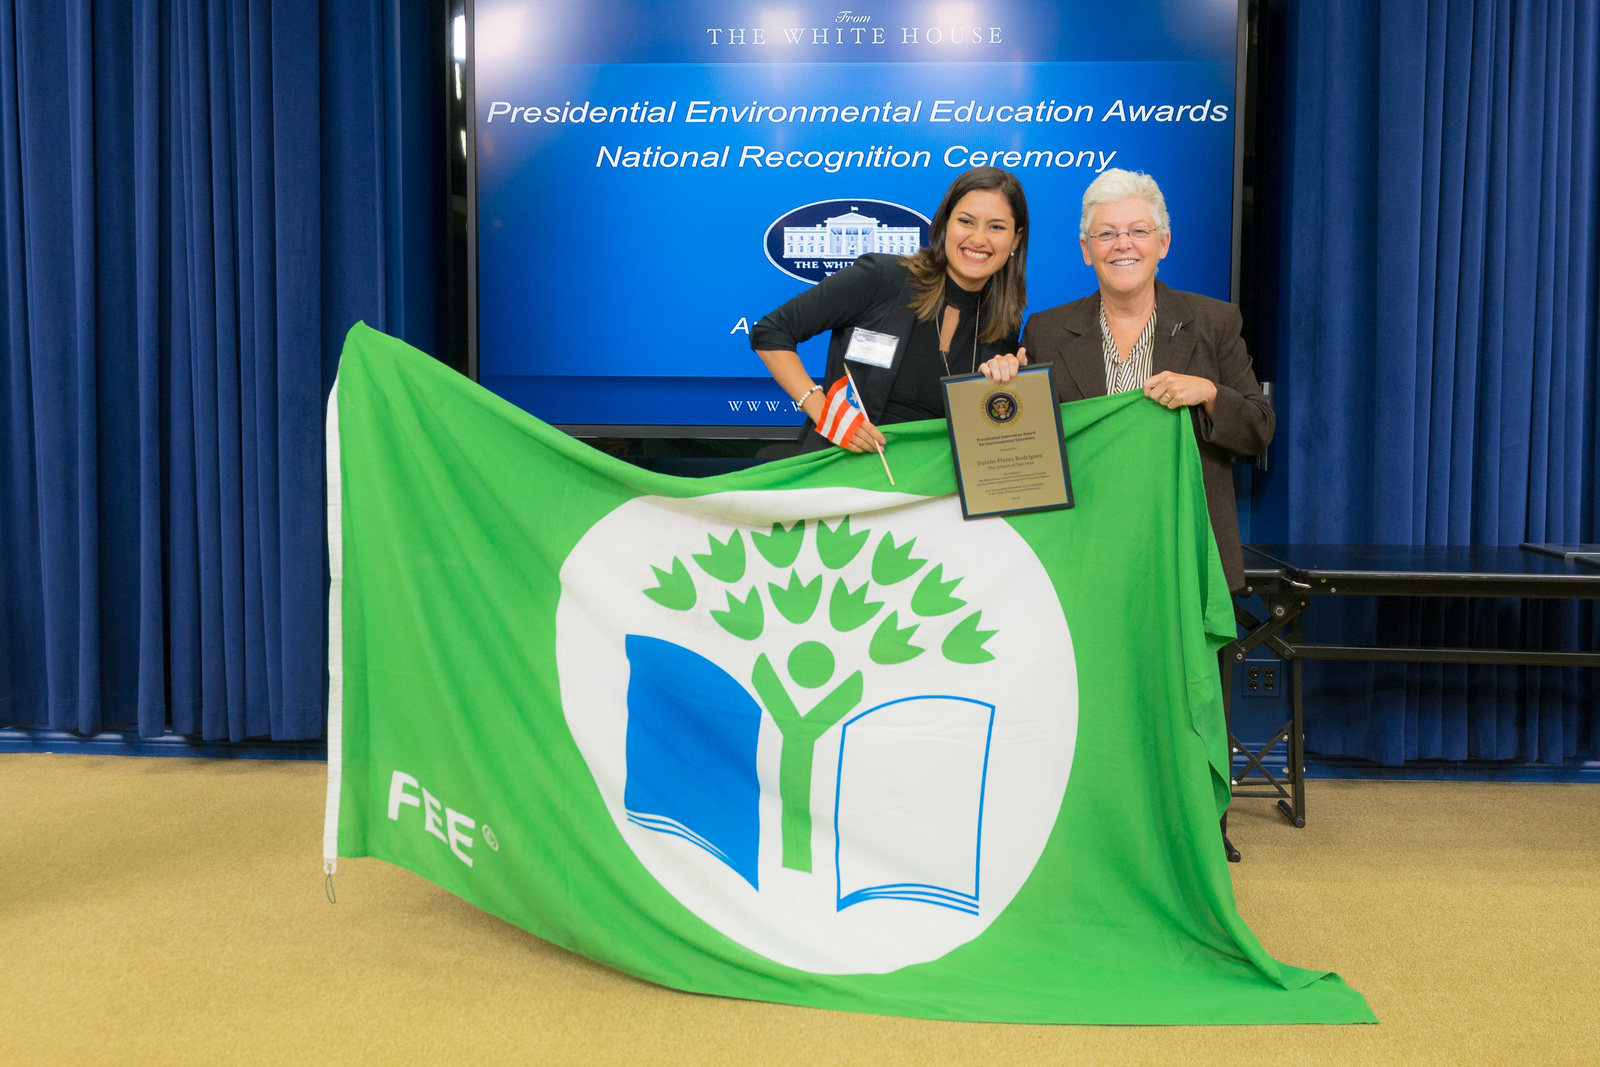 President's Environmental Youth Awards - Presidential Environmental Education Awards [412-APD-1423-2014-08-12_PEYA_204.jpg]